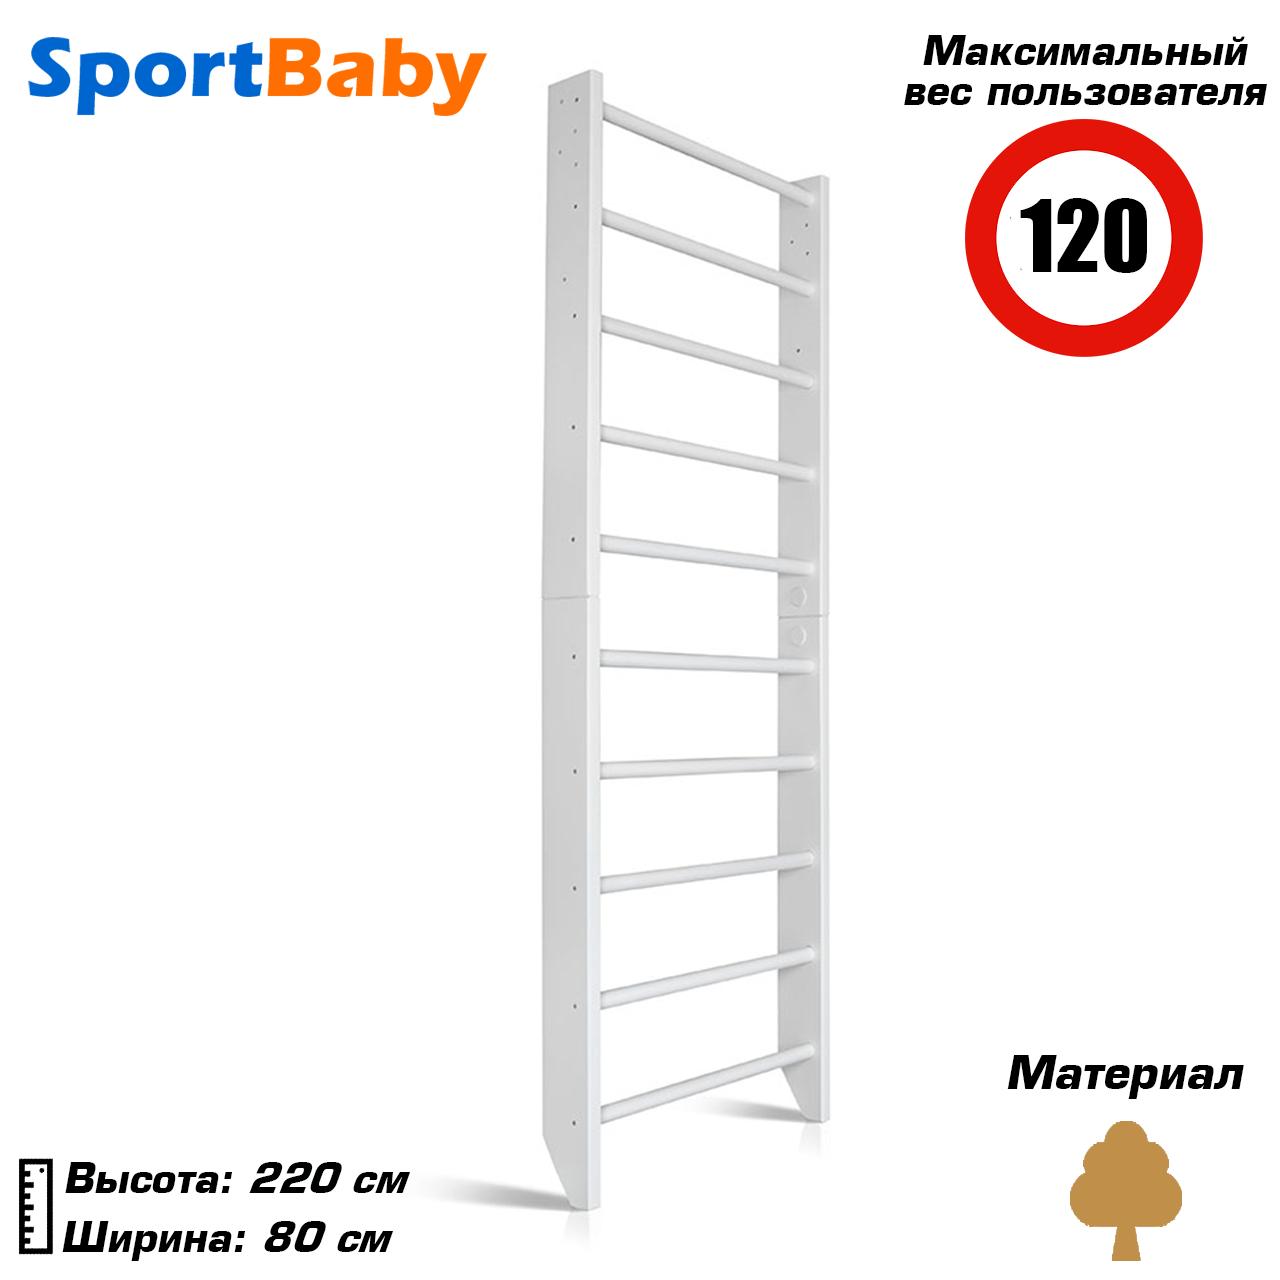 Шведская стенка для детей - 0-220 (White)